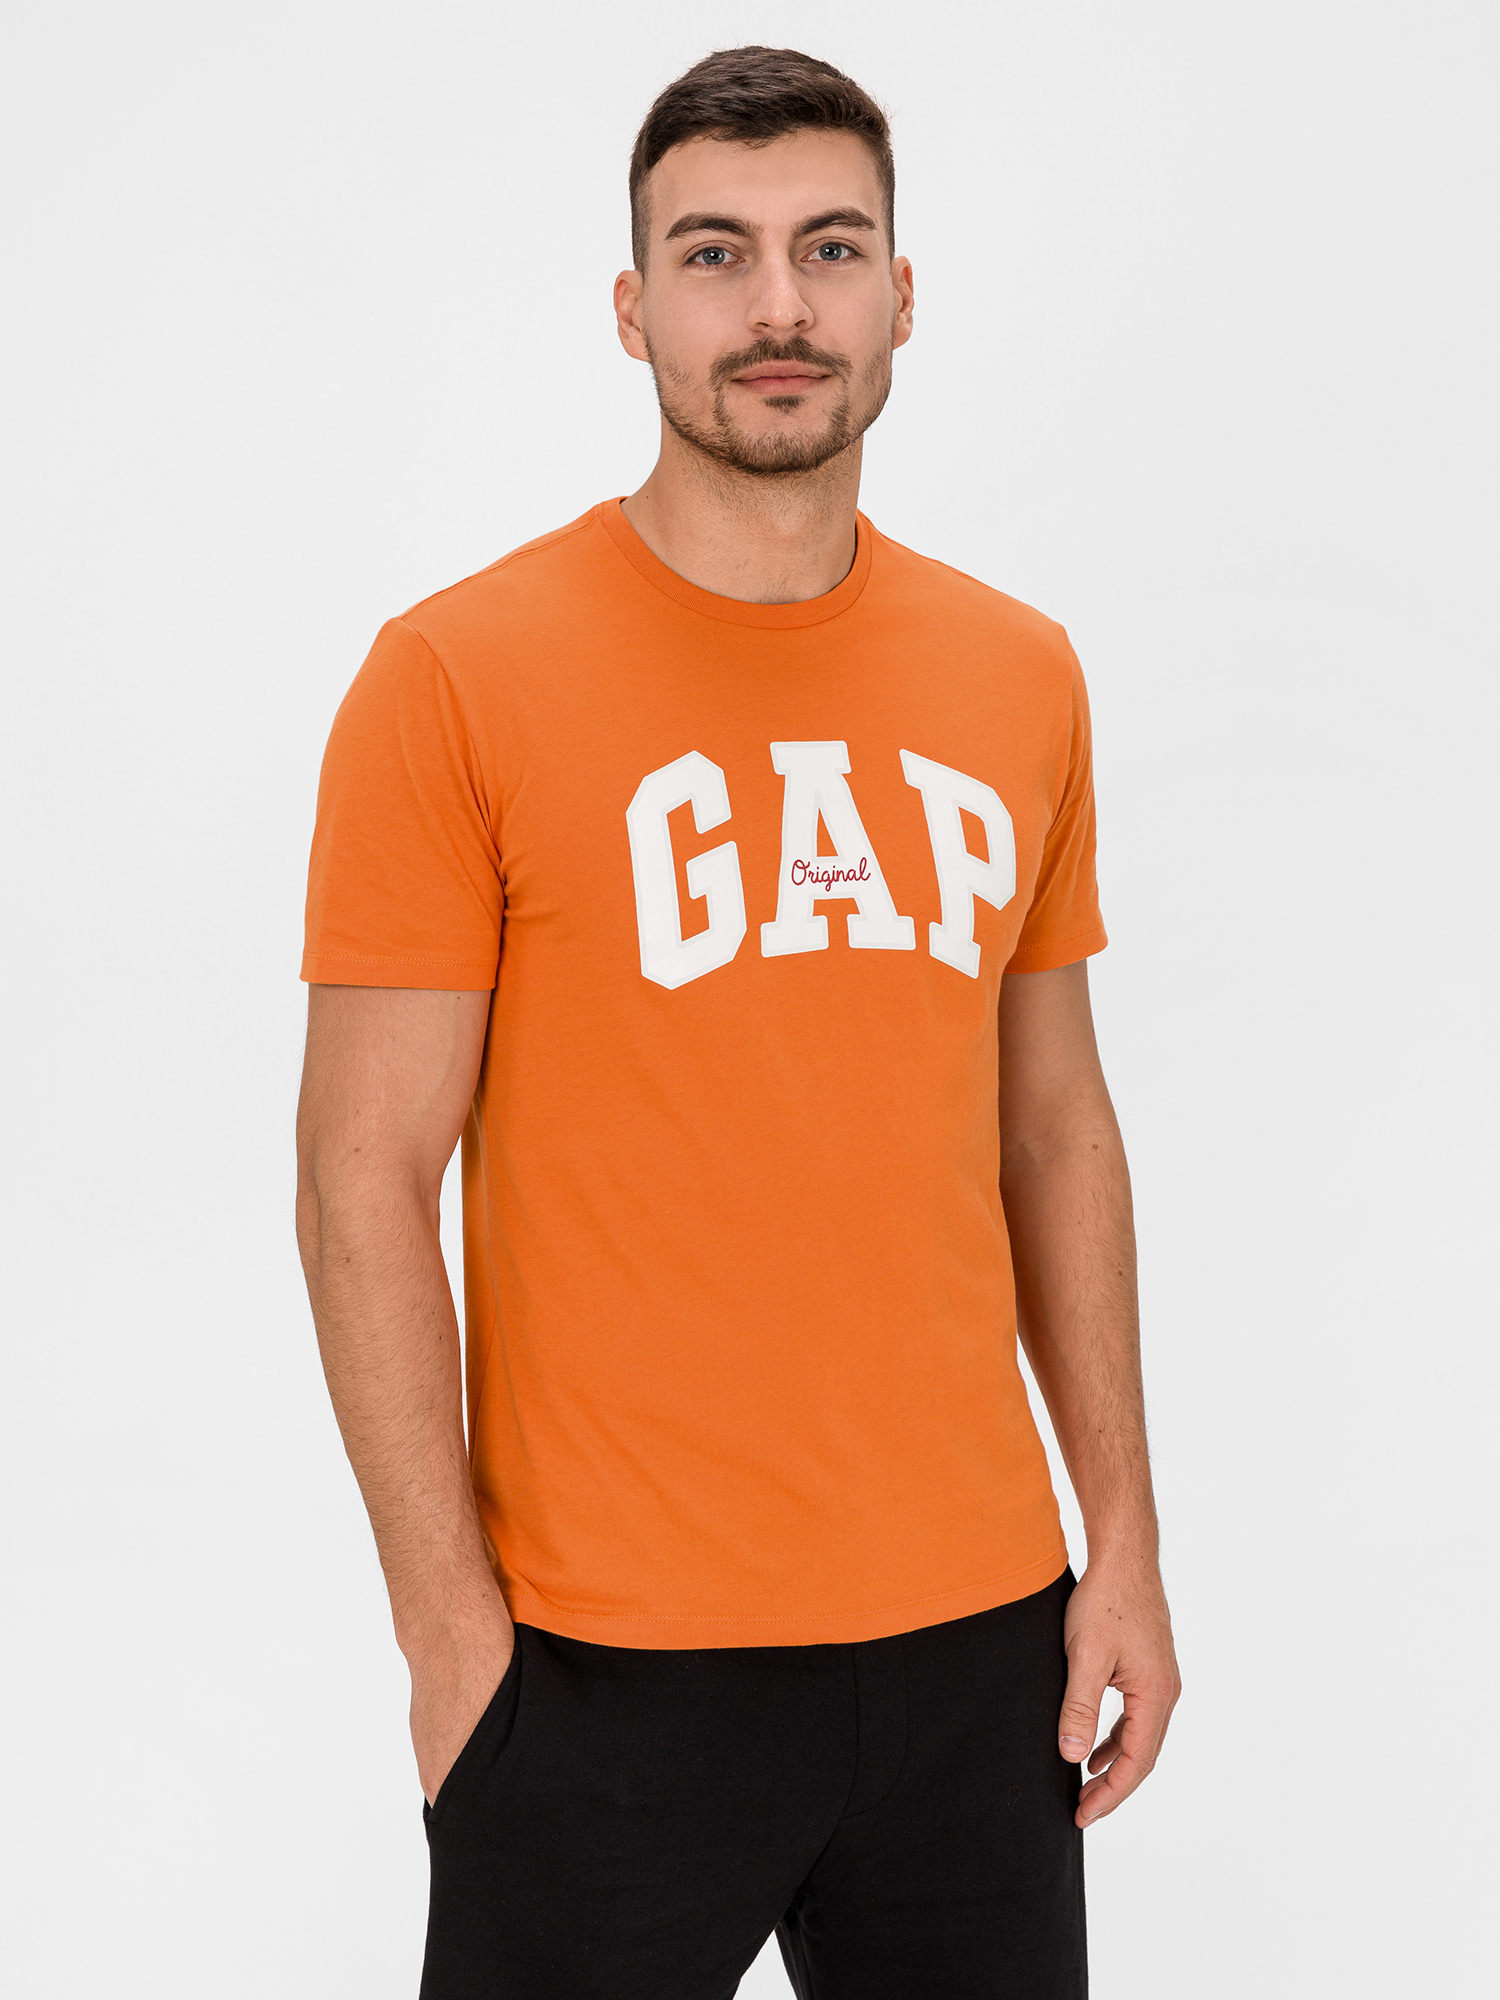 GAP oranžové pánské tričko s logem